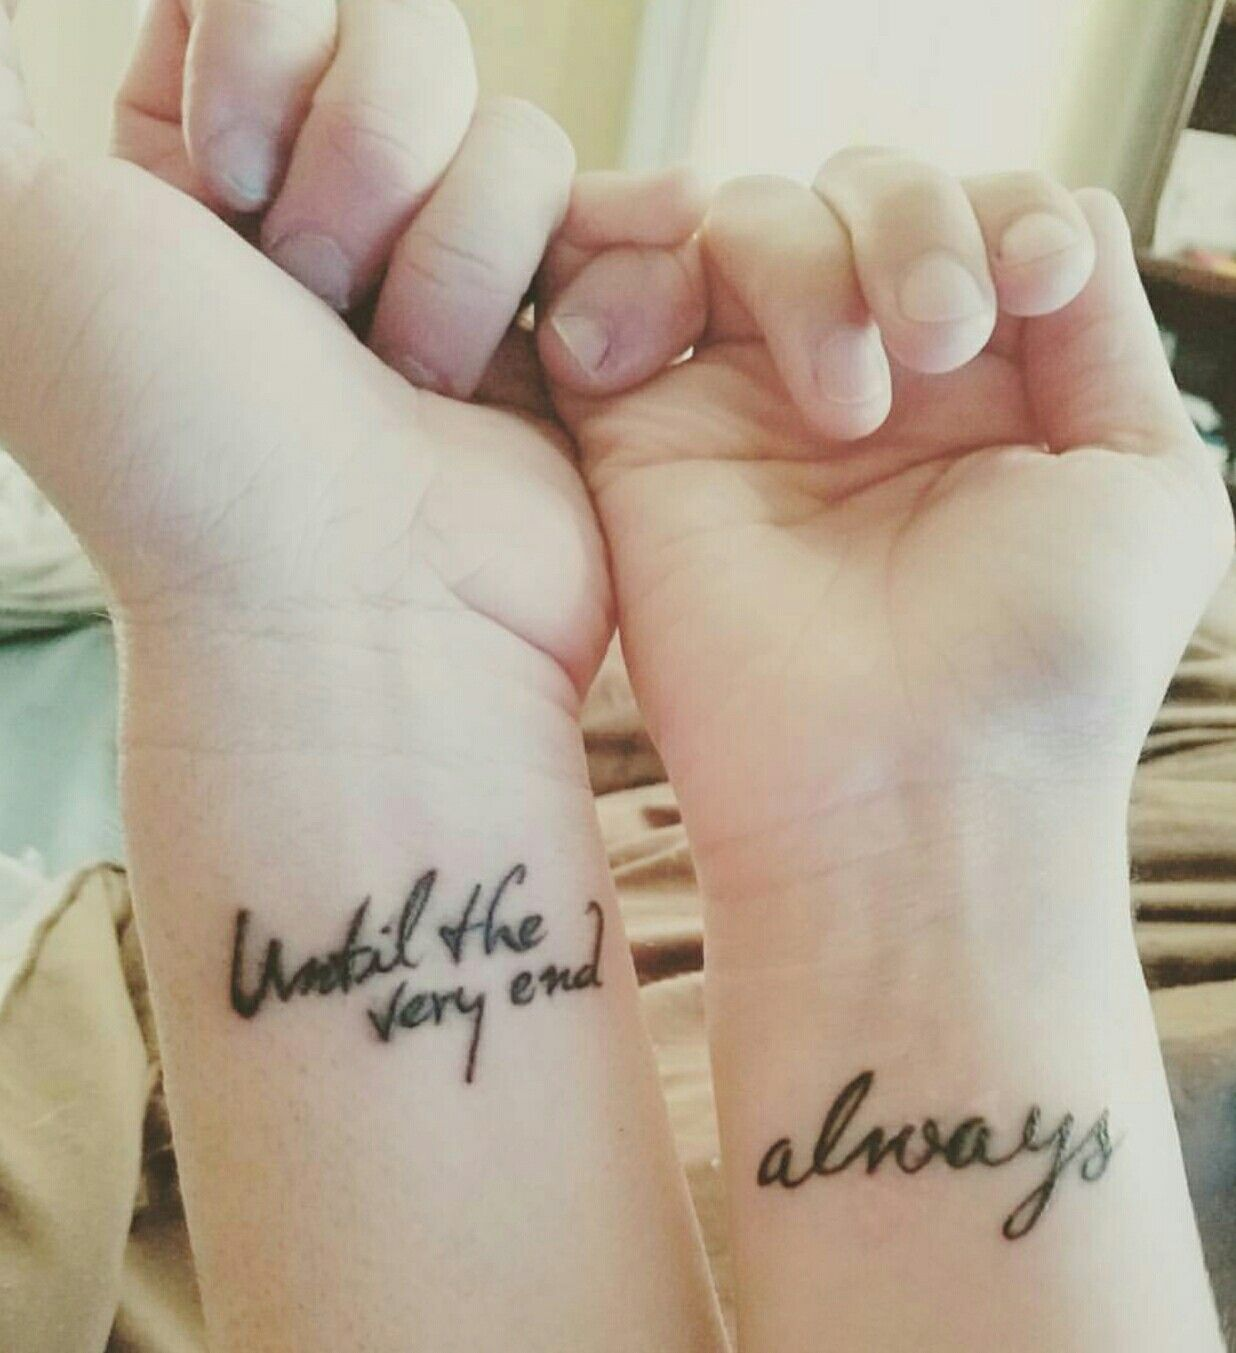 9 17 16 My 4th Tattoo Harry Potter Couples Tattoo Harry Potter Couples Harry Potter Tattoo Small Harry Potter Tattoos